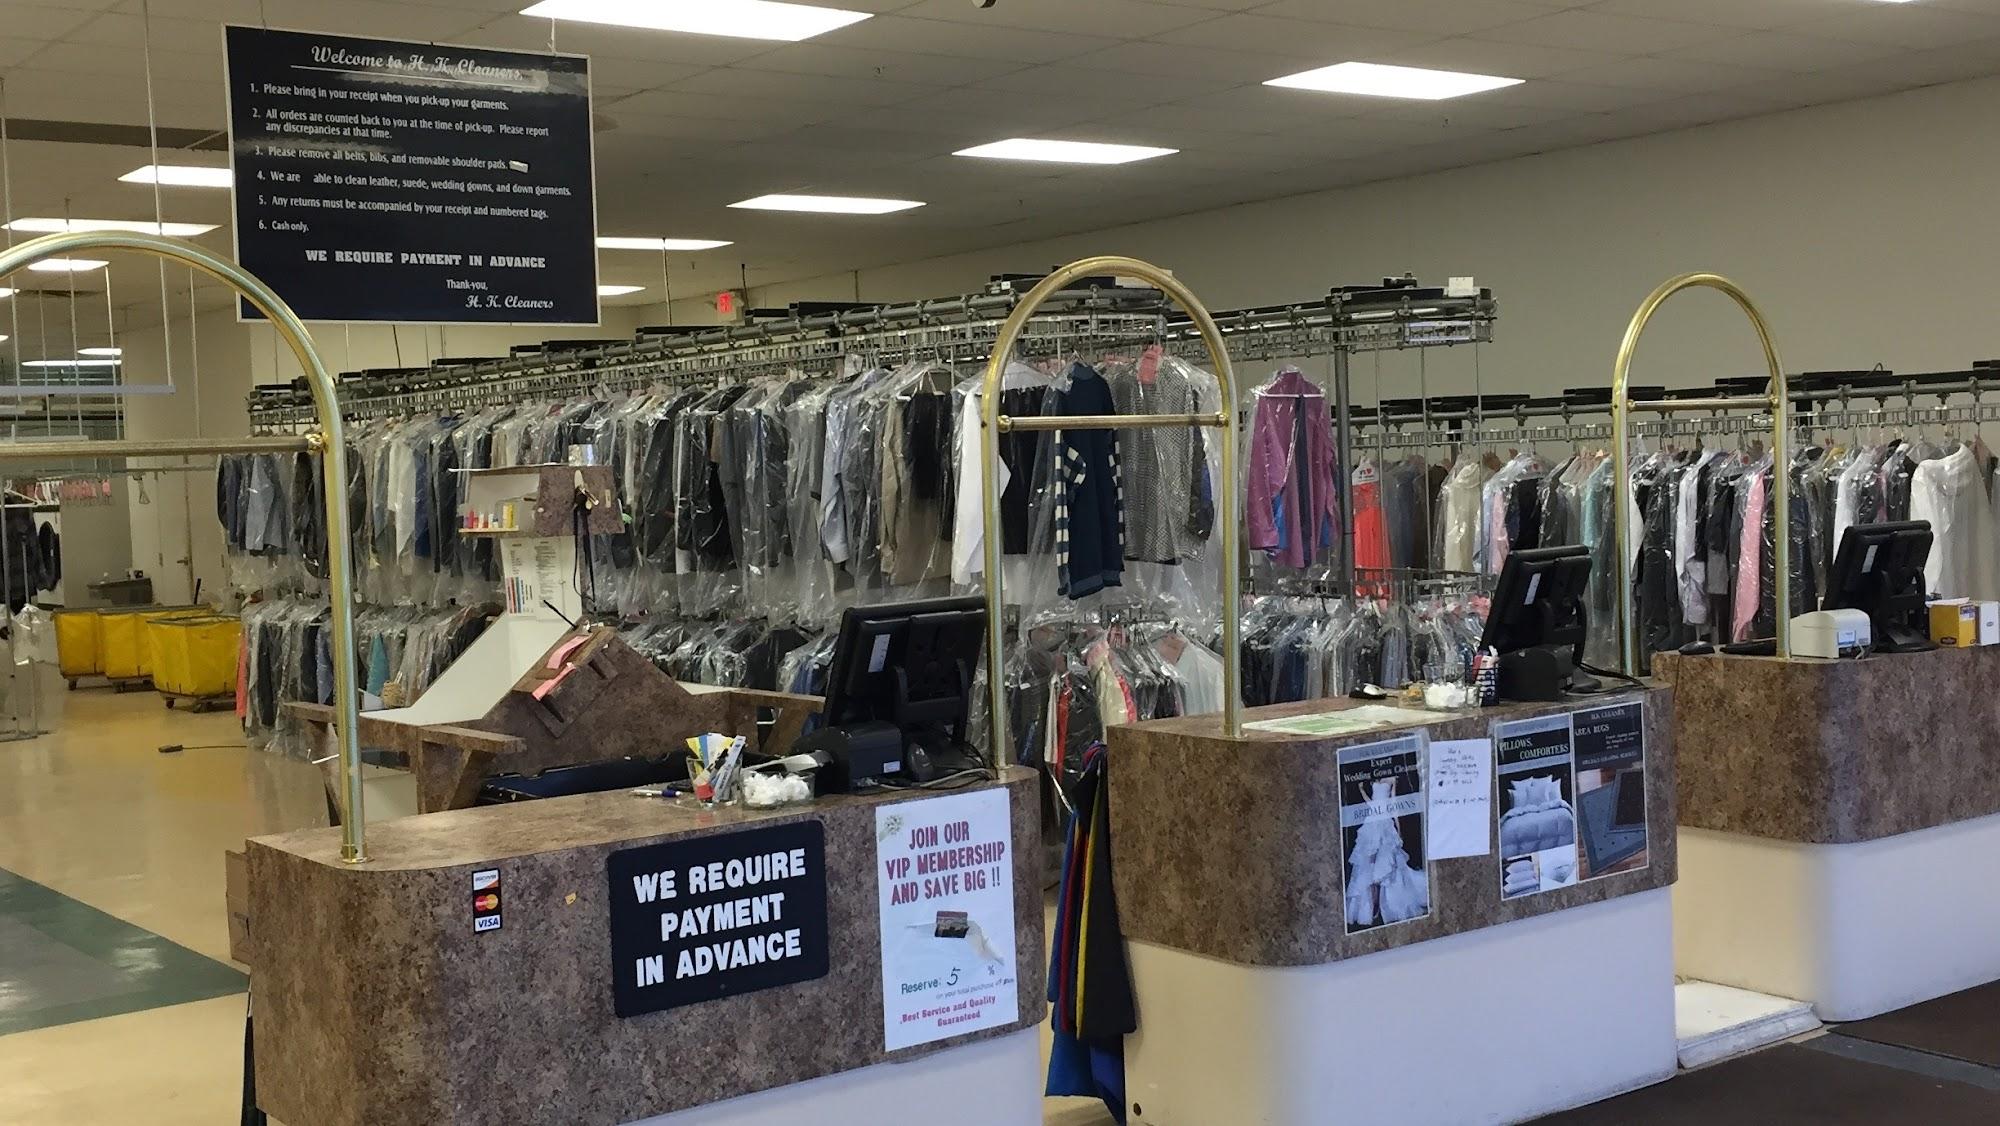 H K Cleaners (new customer 20% coupon!) 29309 Orchard Lake Rd, Farmington Hills